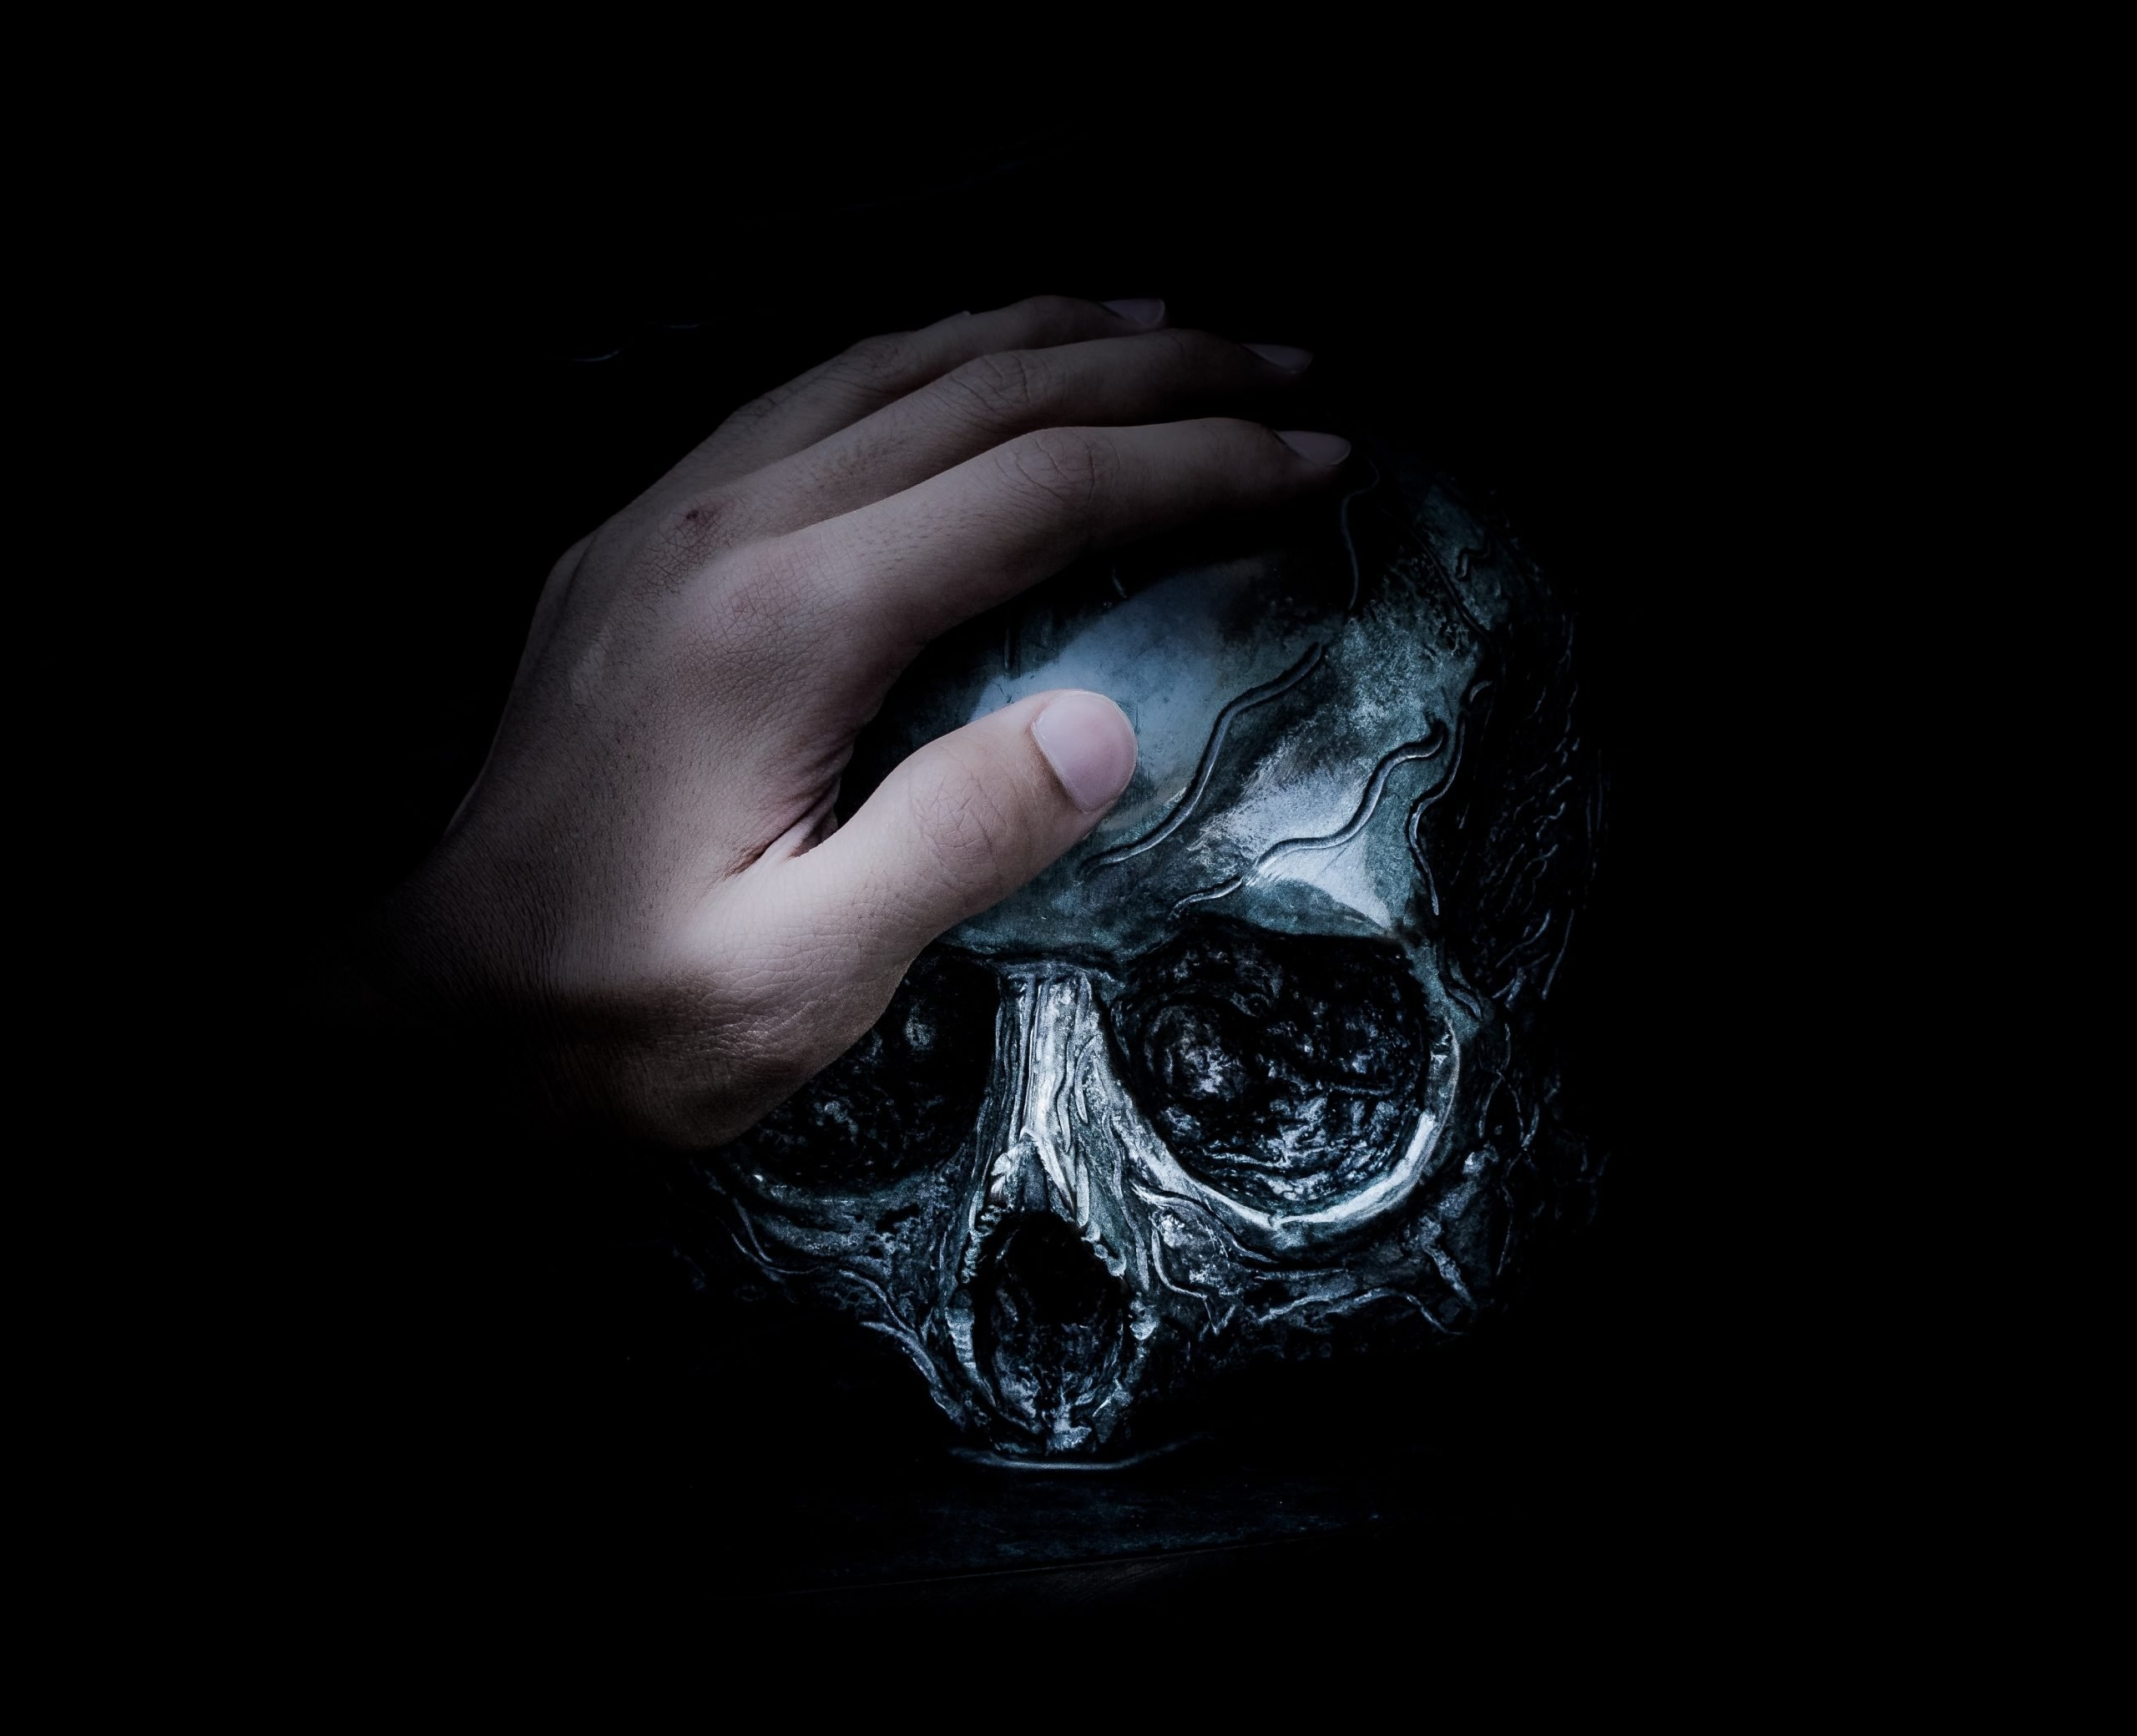 hand holding a skull